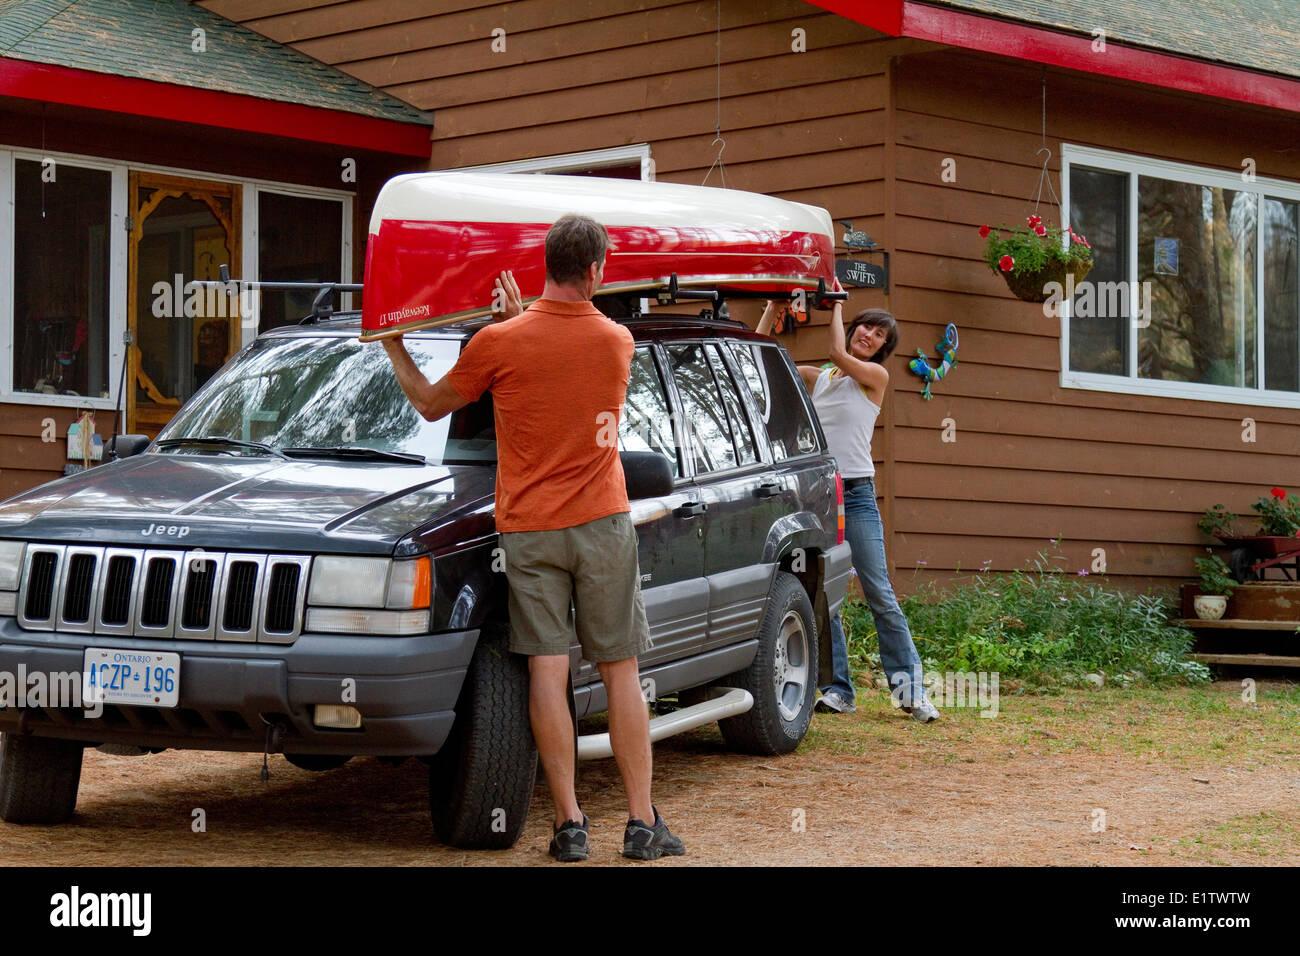 Young couple load canoe on roof of vehicle at cottage near Oxtongue Lake, Muskoka, Ontario, Canada. - Stock Image